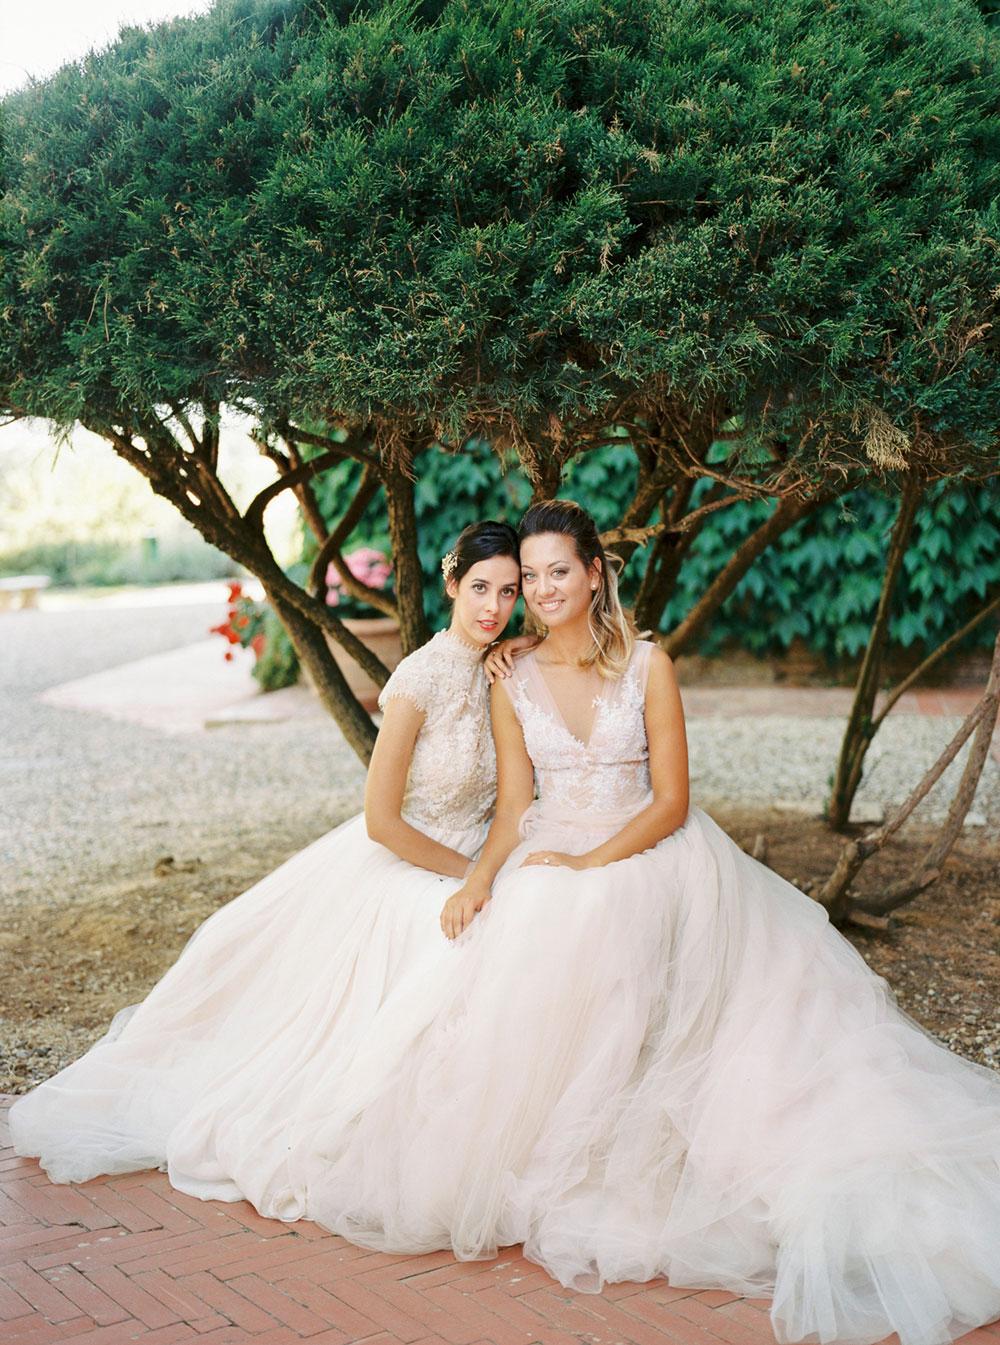 Linari-Tuscany-Elopement-Courtney-Michaela-223